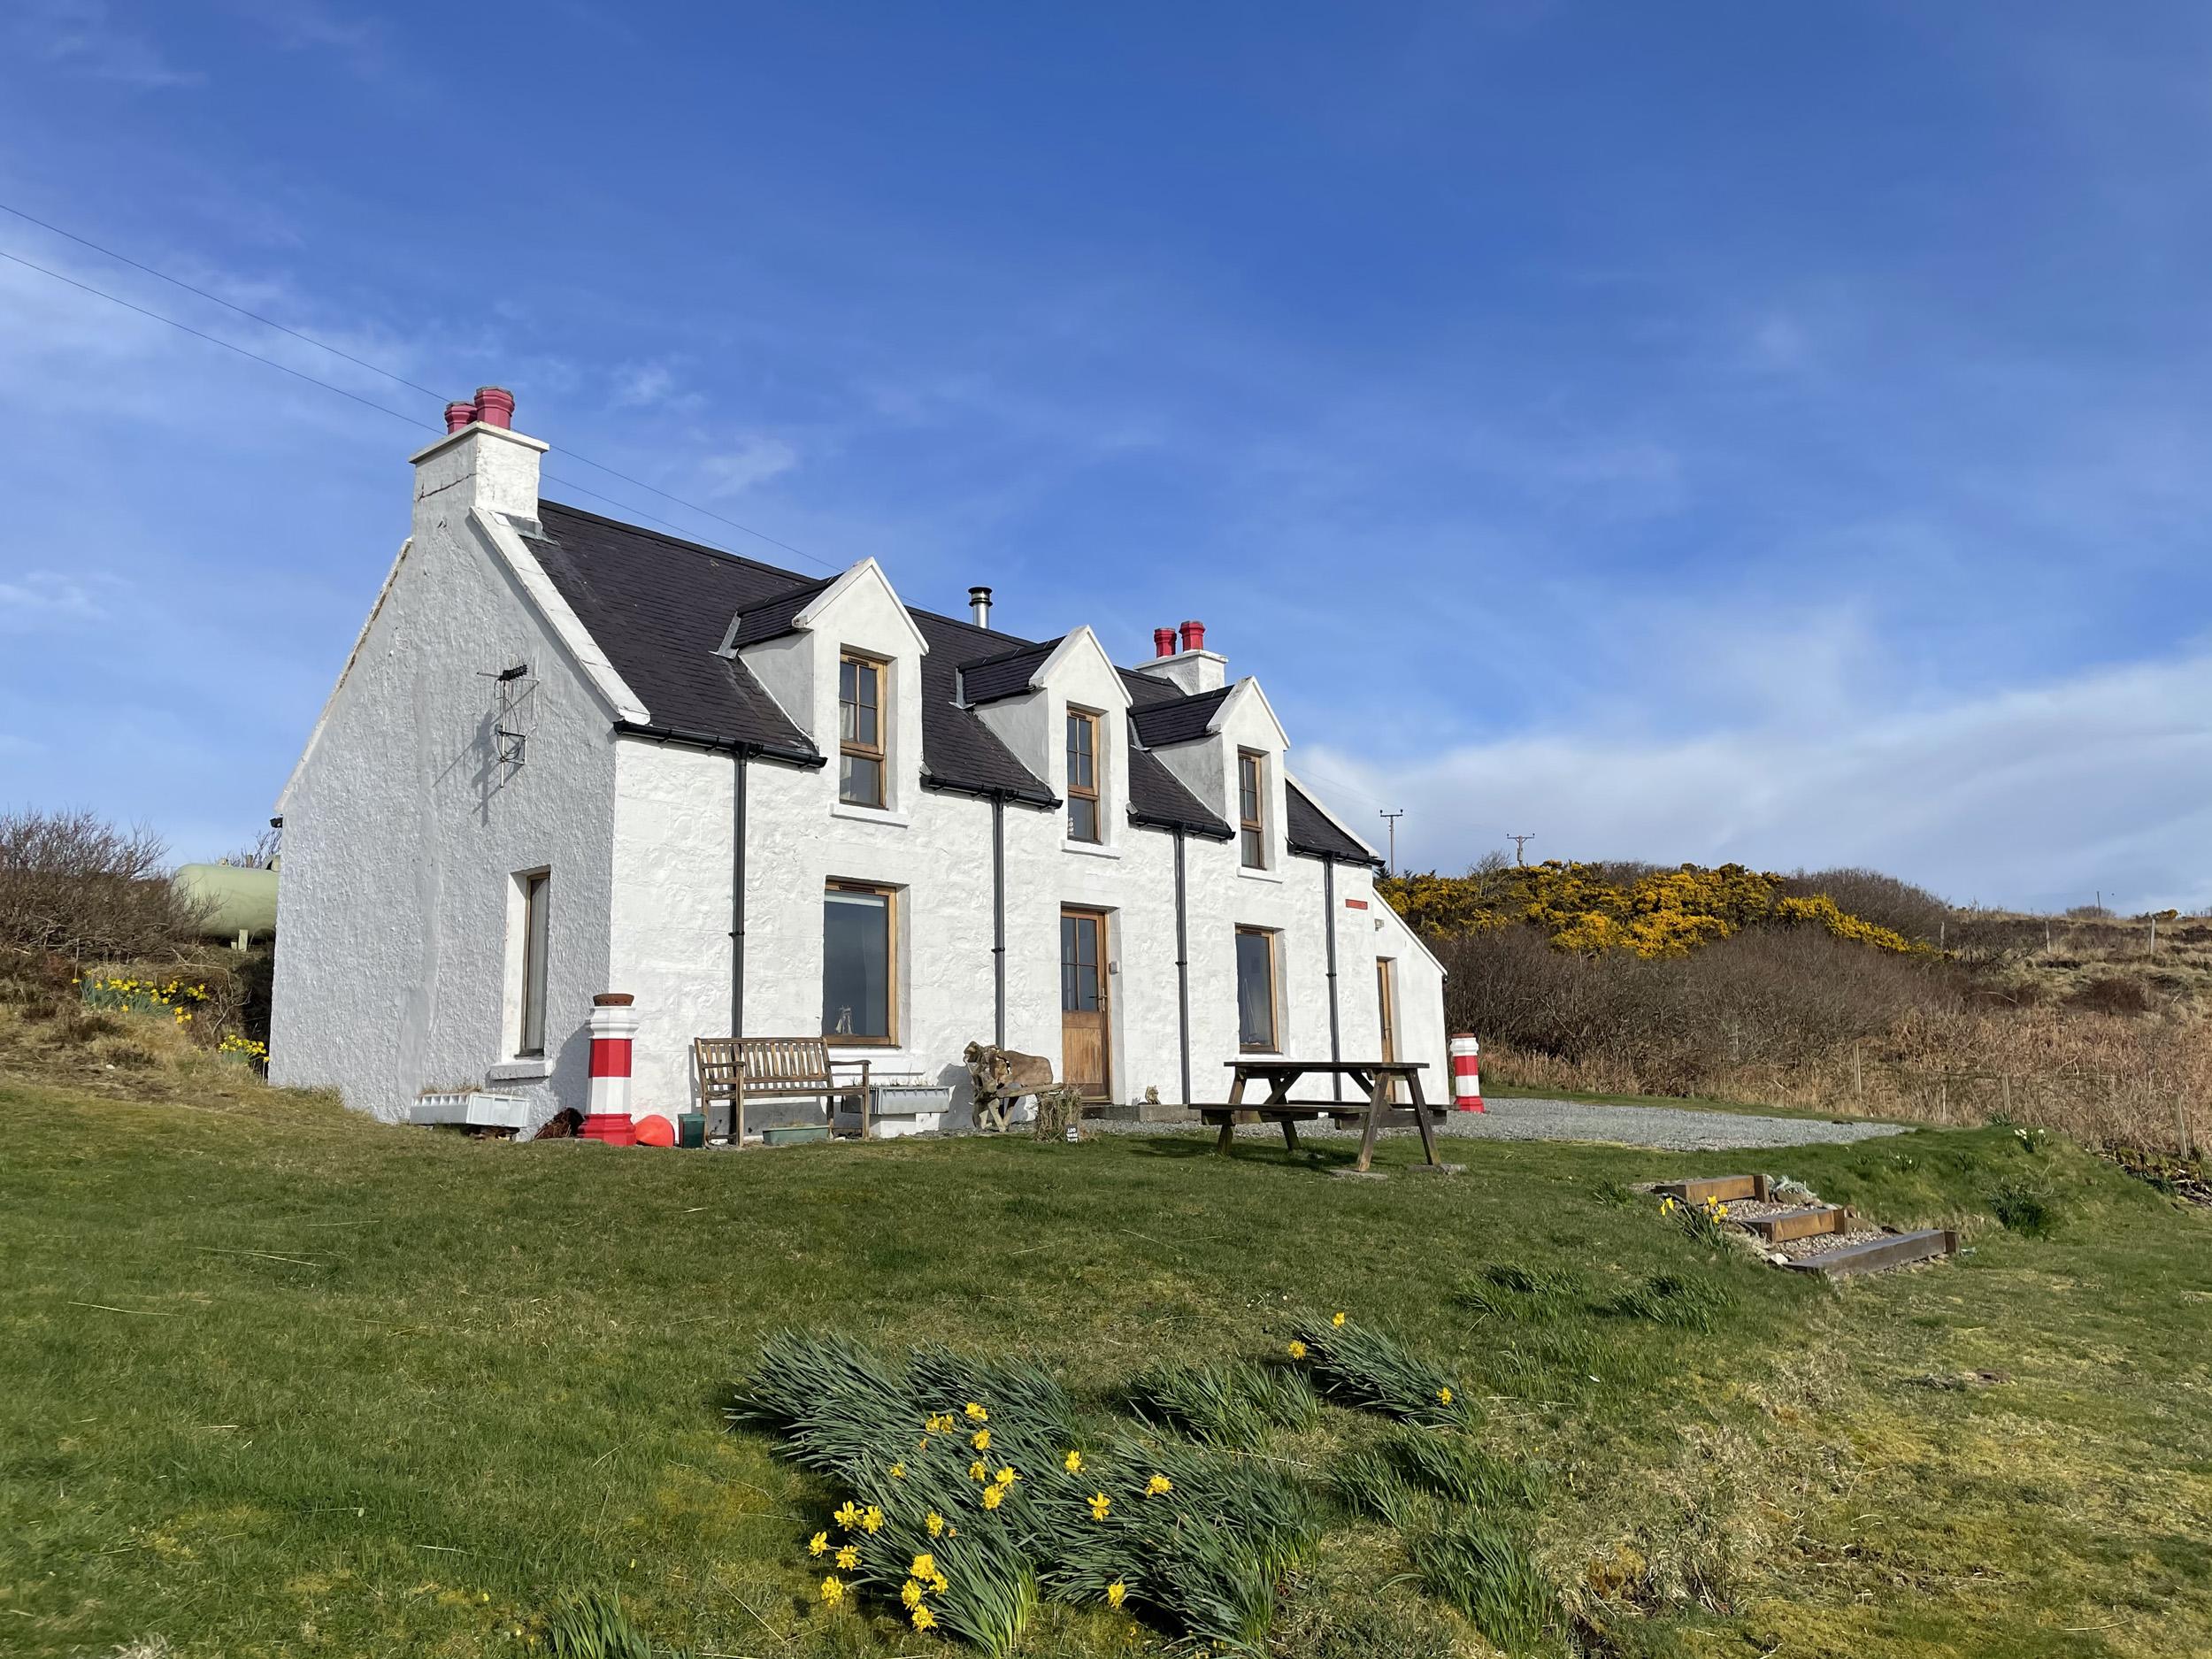 Red Chimneys Cottage, Dunvegan